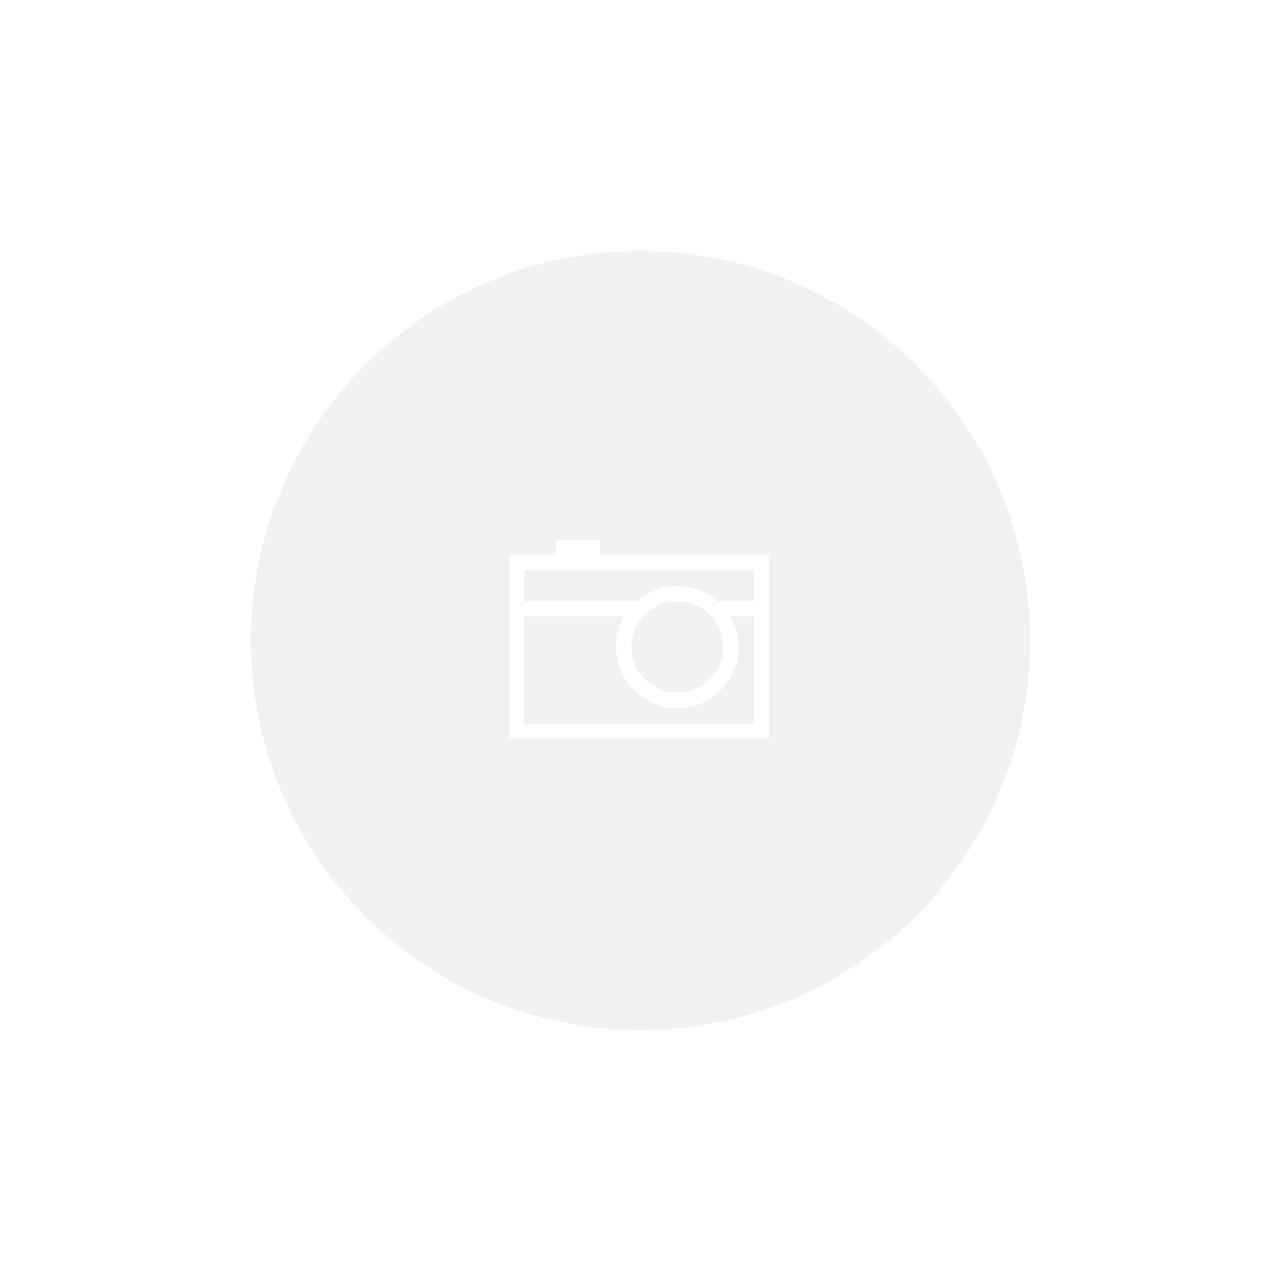 GUIDÃO 31.8MM ABSOLUTE RISE ALTO 60mm (720MM)